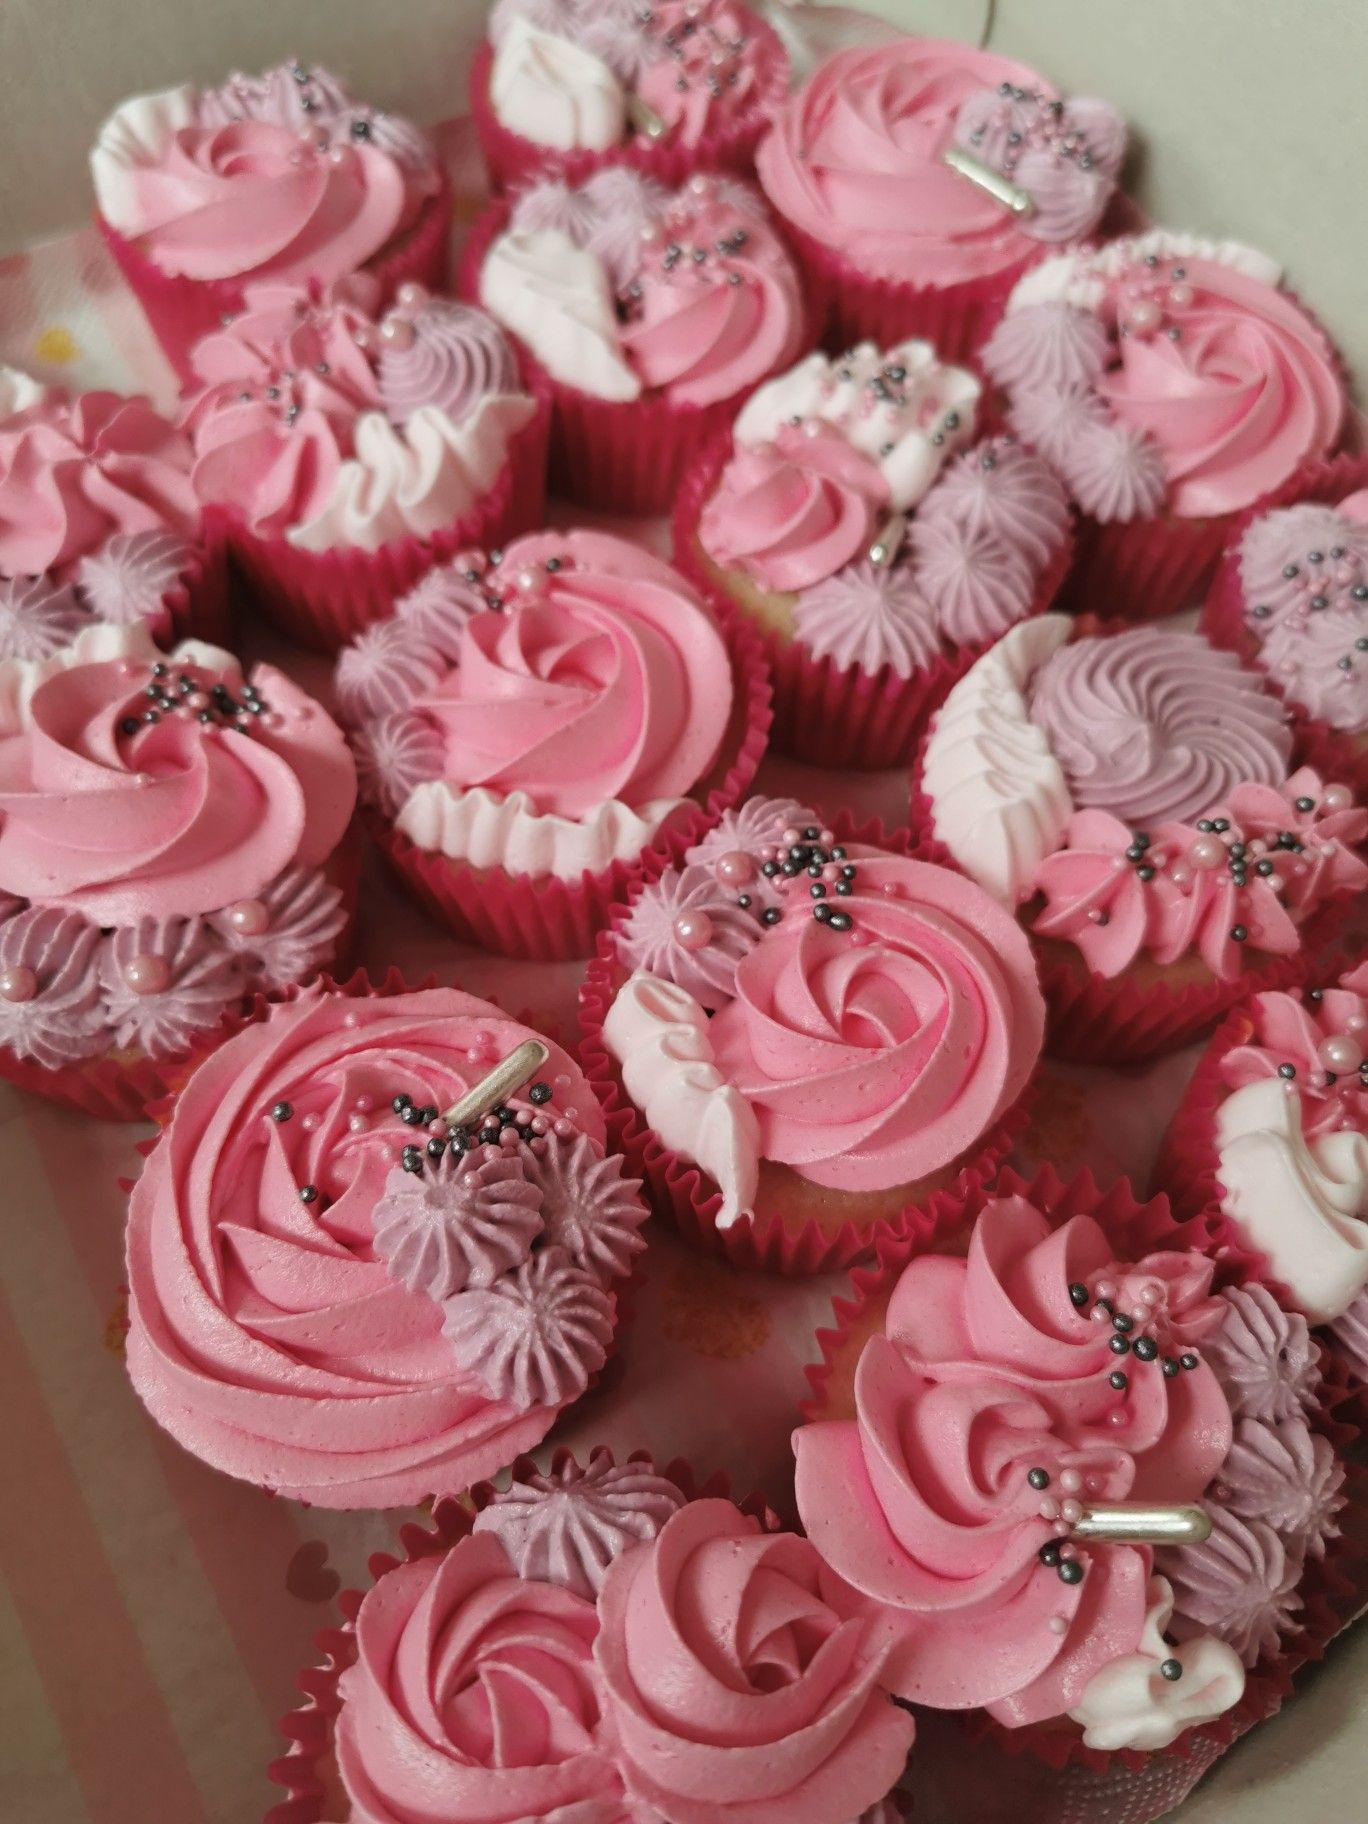 Pin By Marcia Swart On Food Cupcake Cake Designs Floral